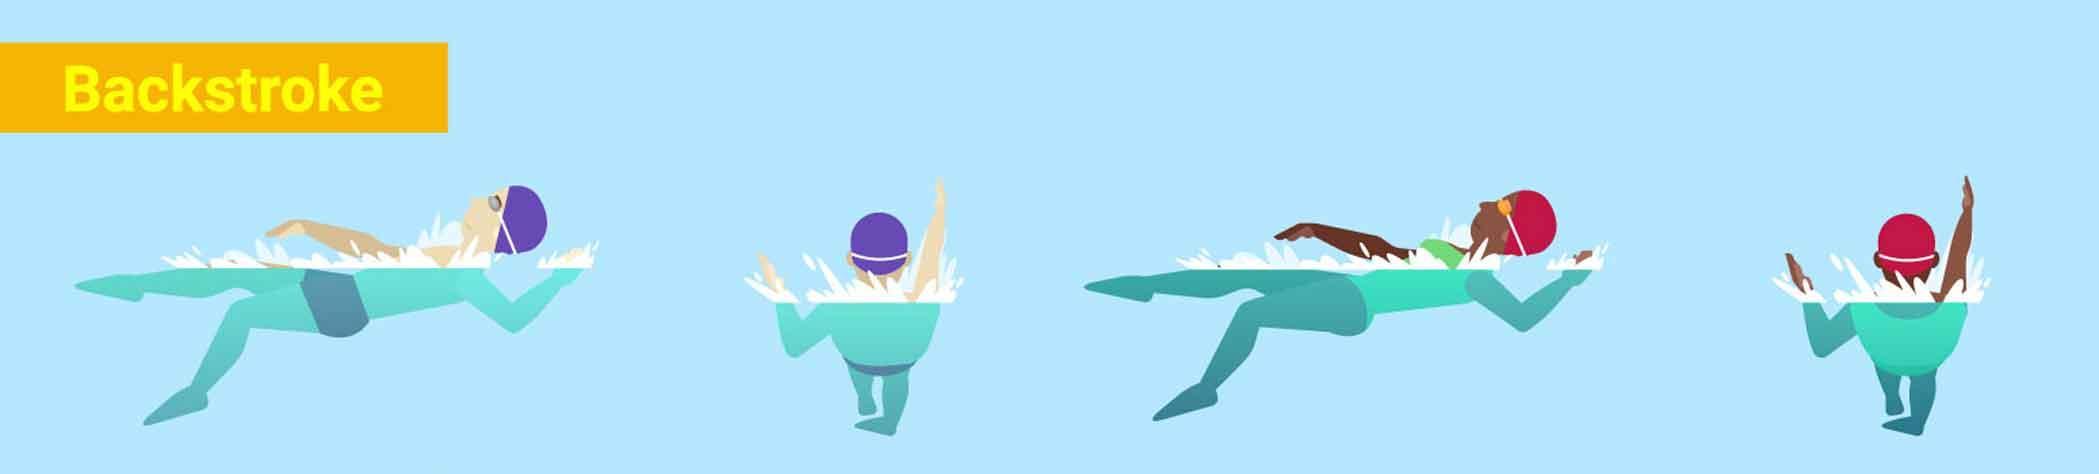 treinamento-funcional-para-nadadores-de-costas